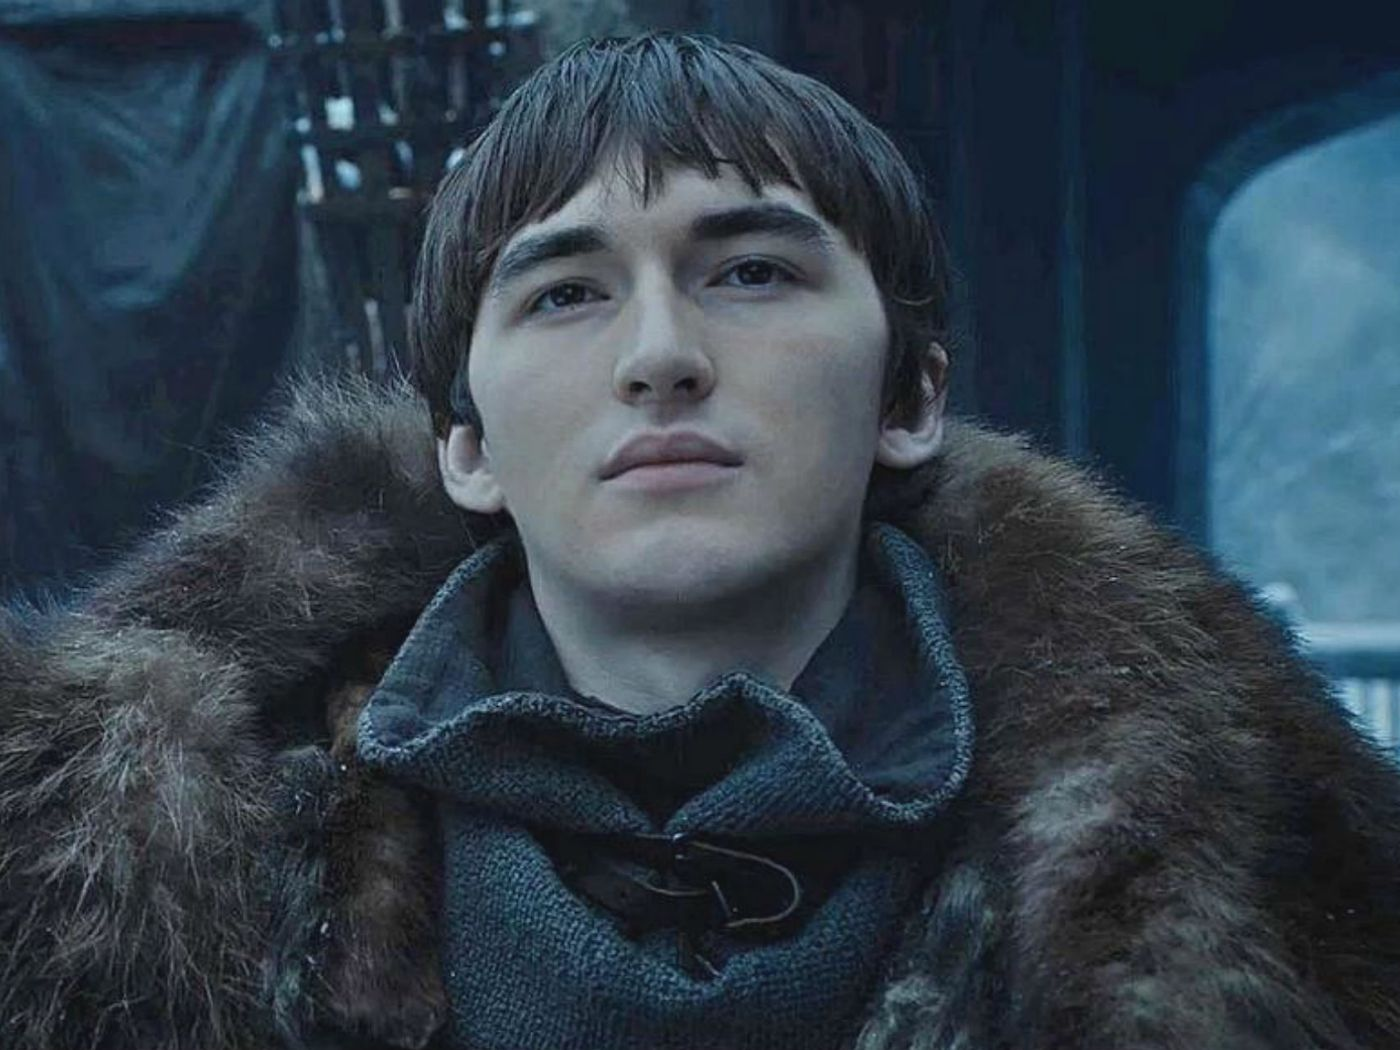 Game of Thrones' Isaac Hempstead Wright: Bran Stark had best storyline